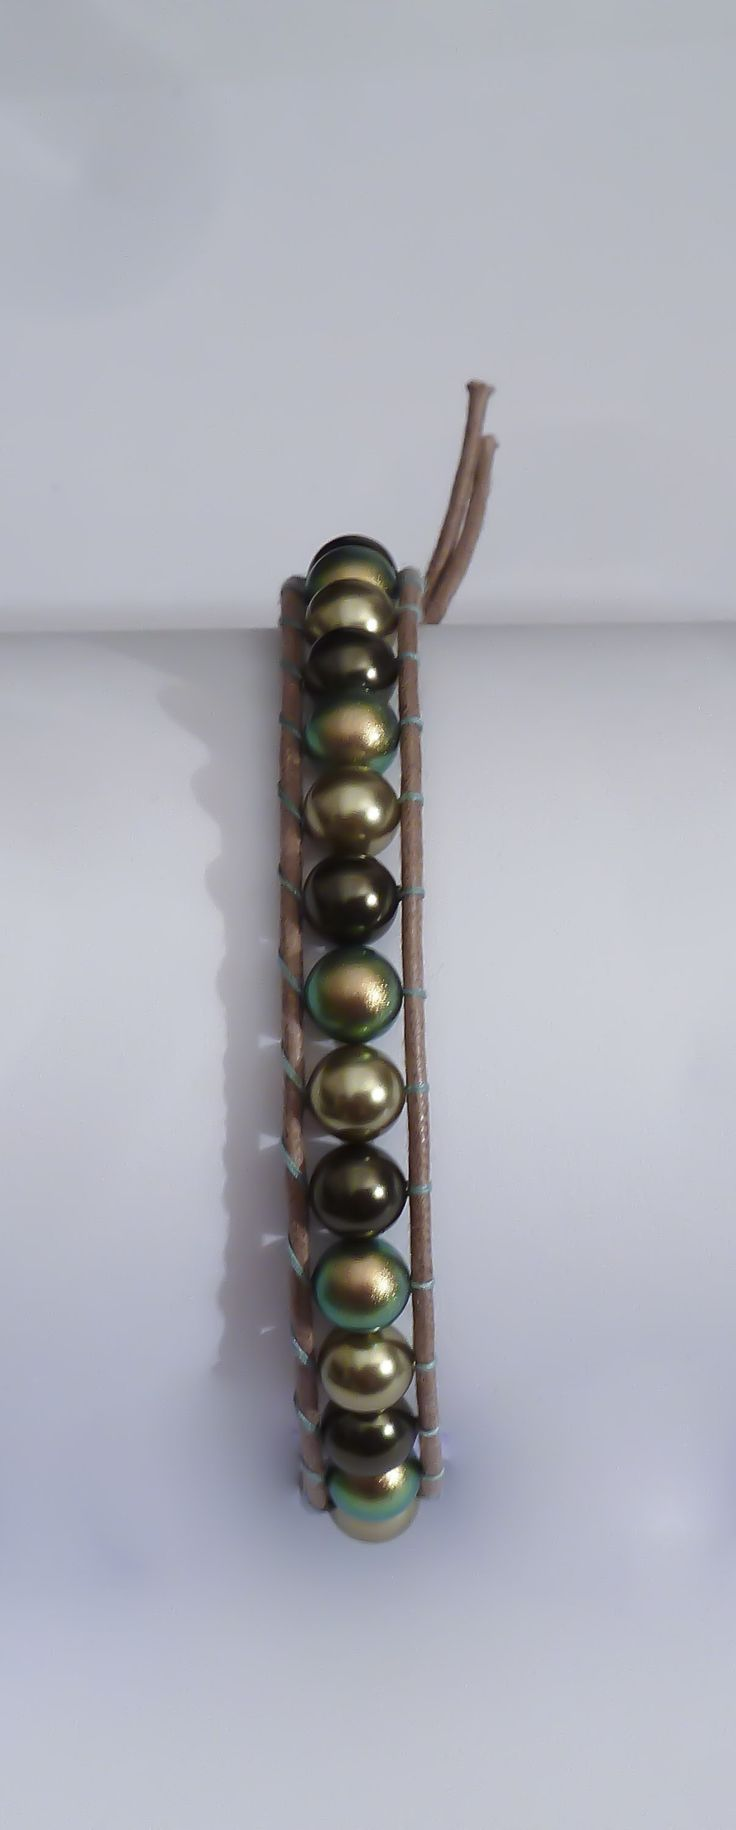 Chan Luu style di swarovski in tre tonalità di verde